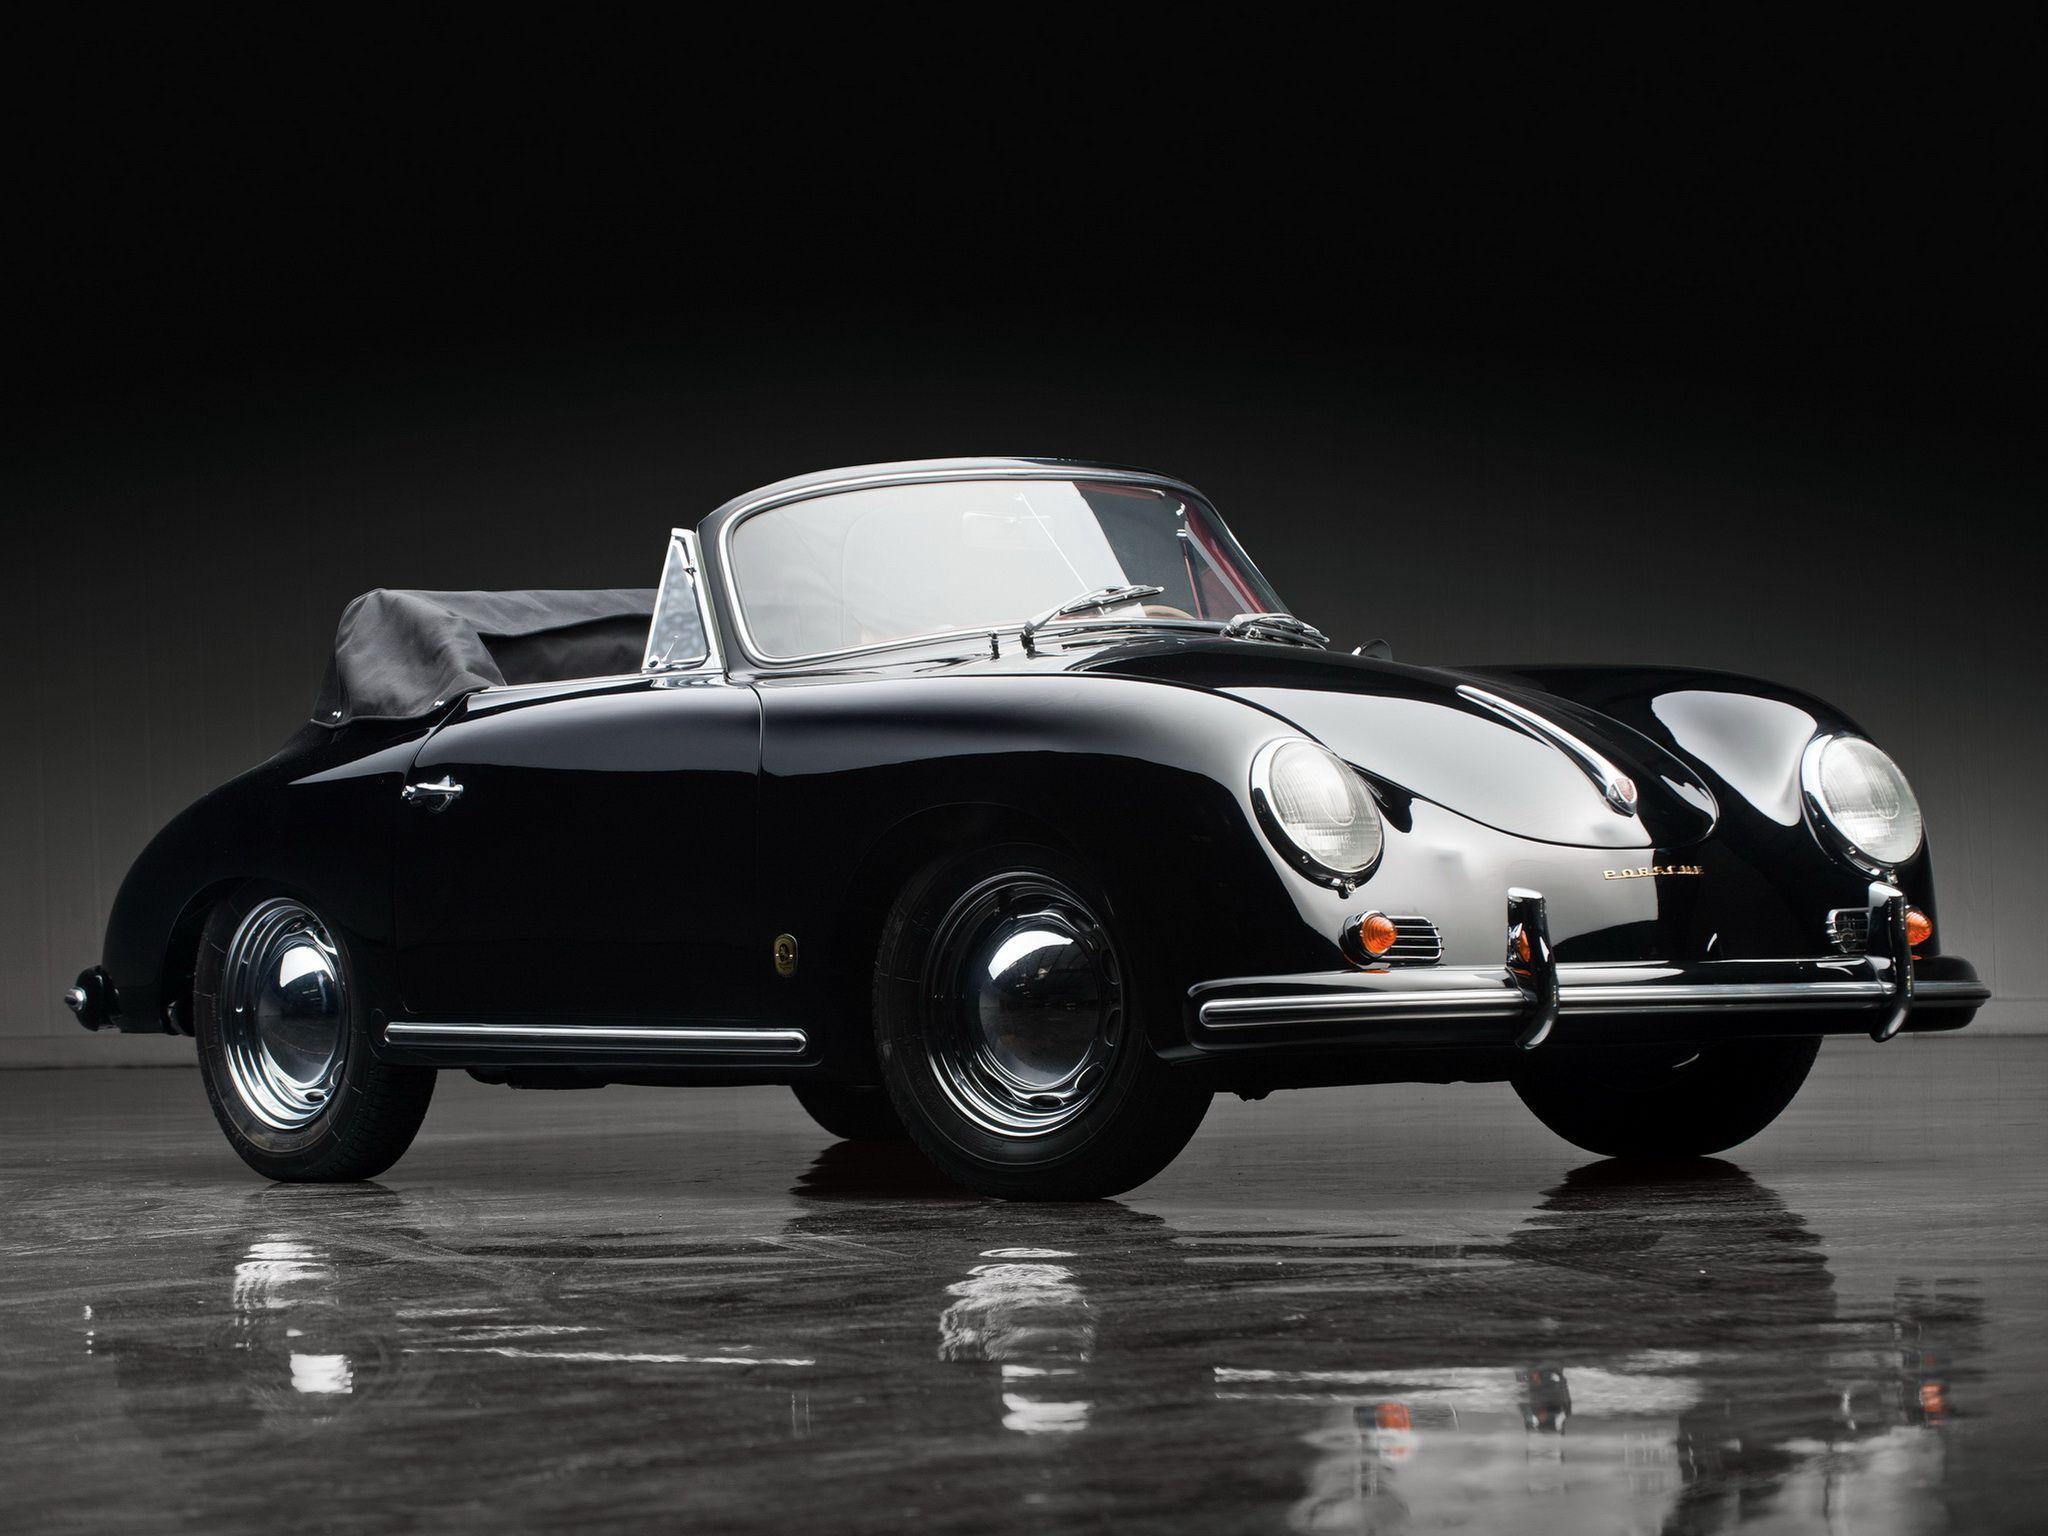 Jaguar f pace d300 r dynamic black pack 2021 4k hd cars. Vintage Car Wallpaper Black